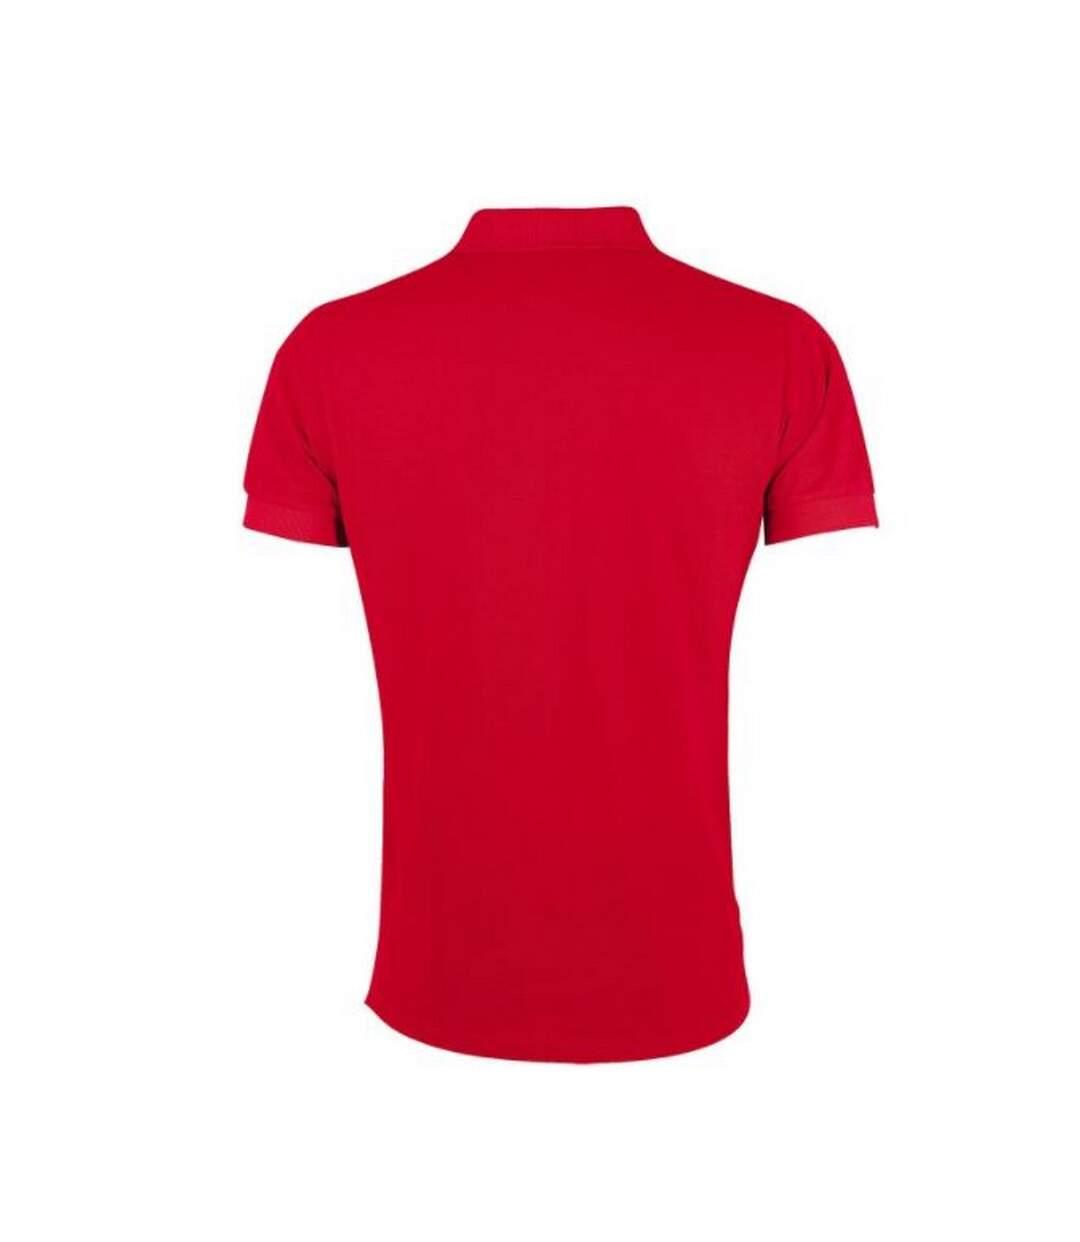 SOLS Mens Portland Short Sleeve Pique Polo Shirt (Red) - UTPC2183